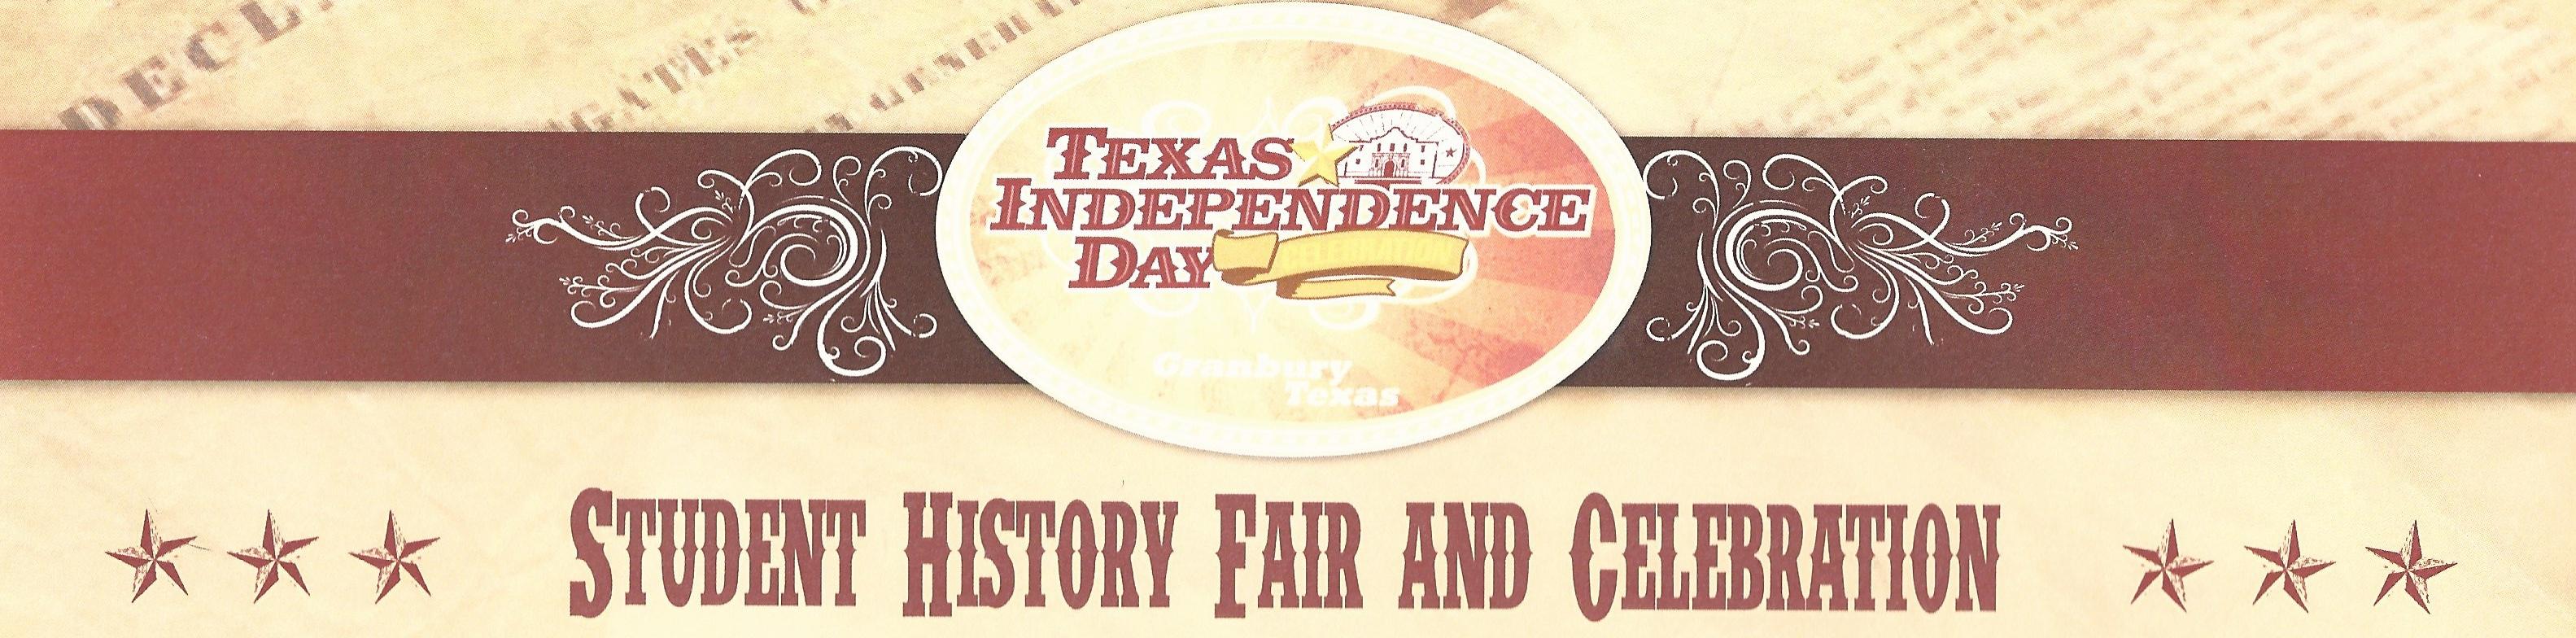 Save Texas History